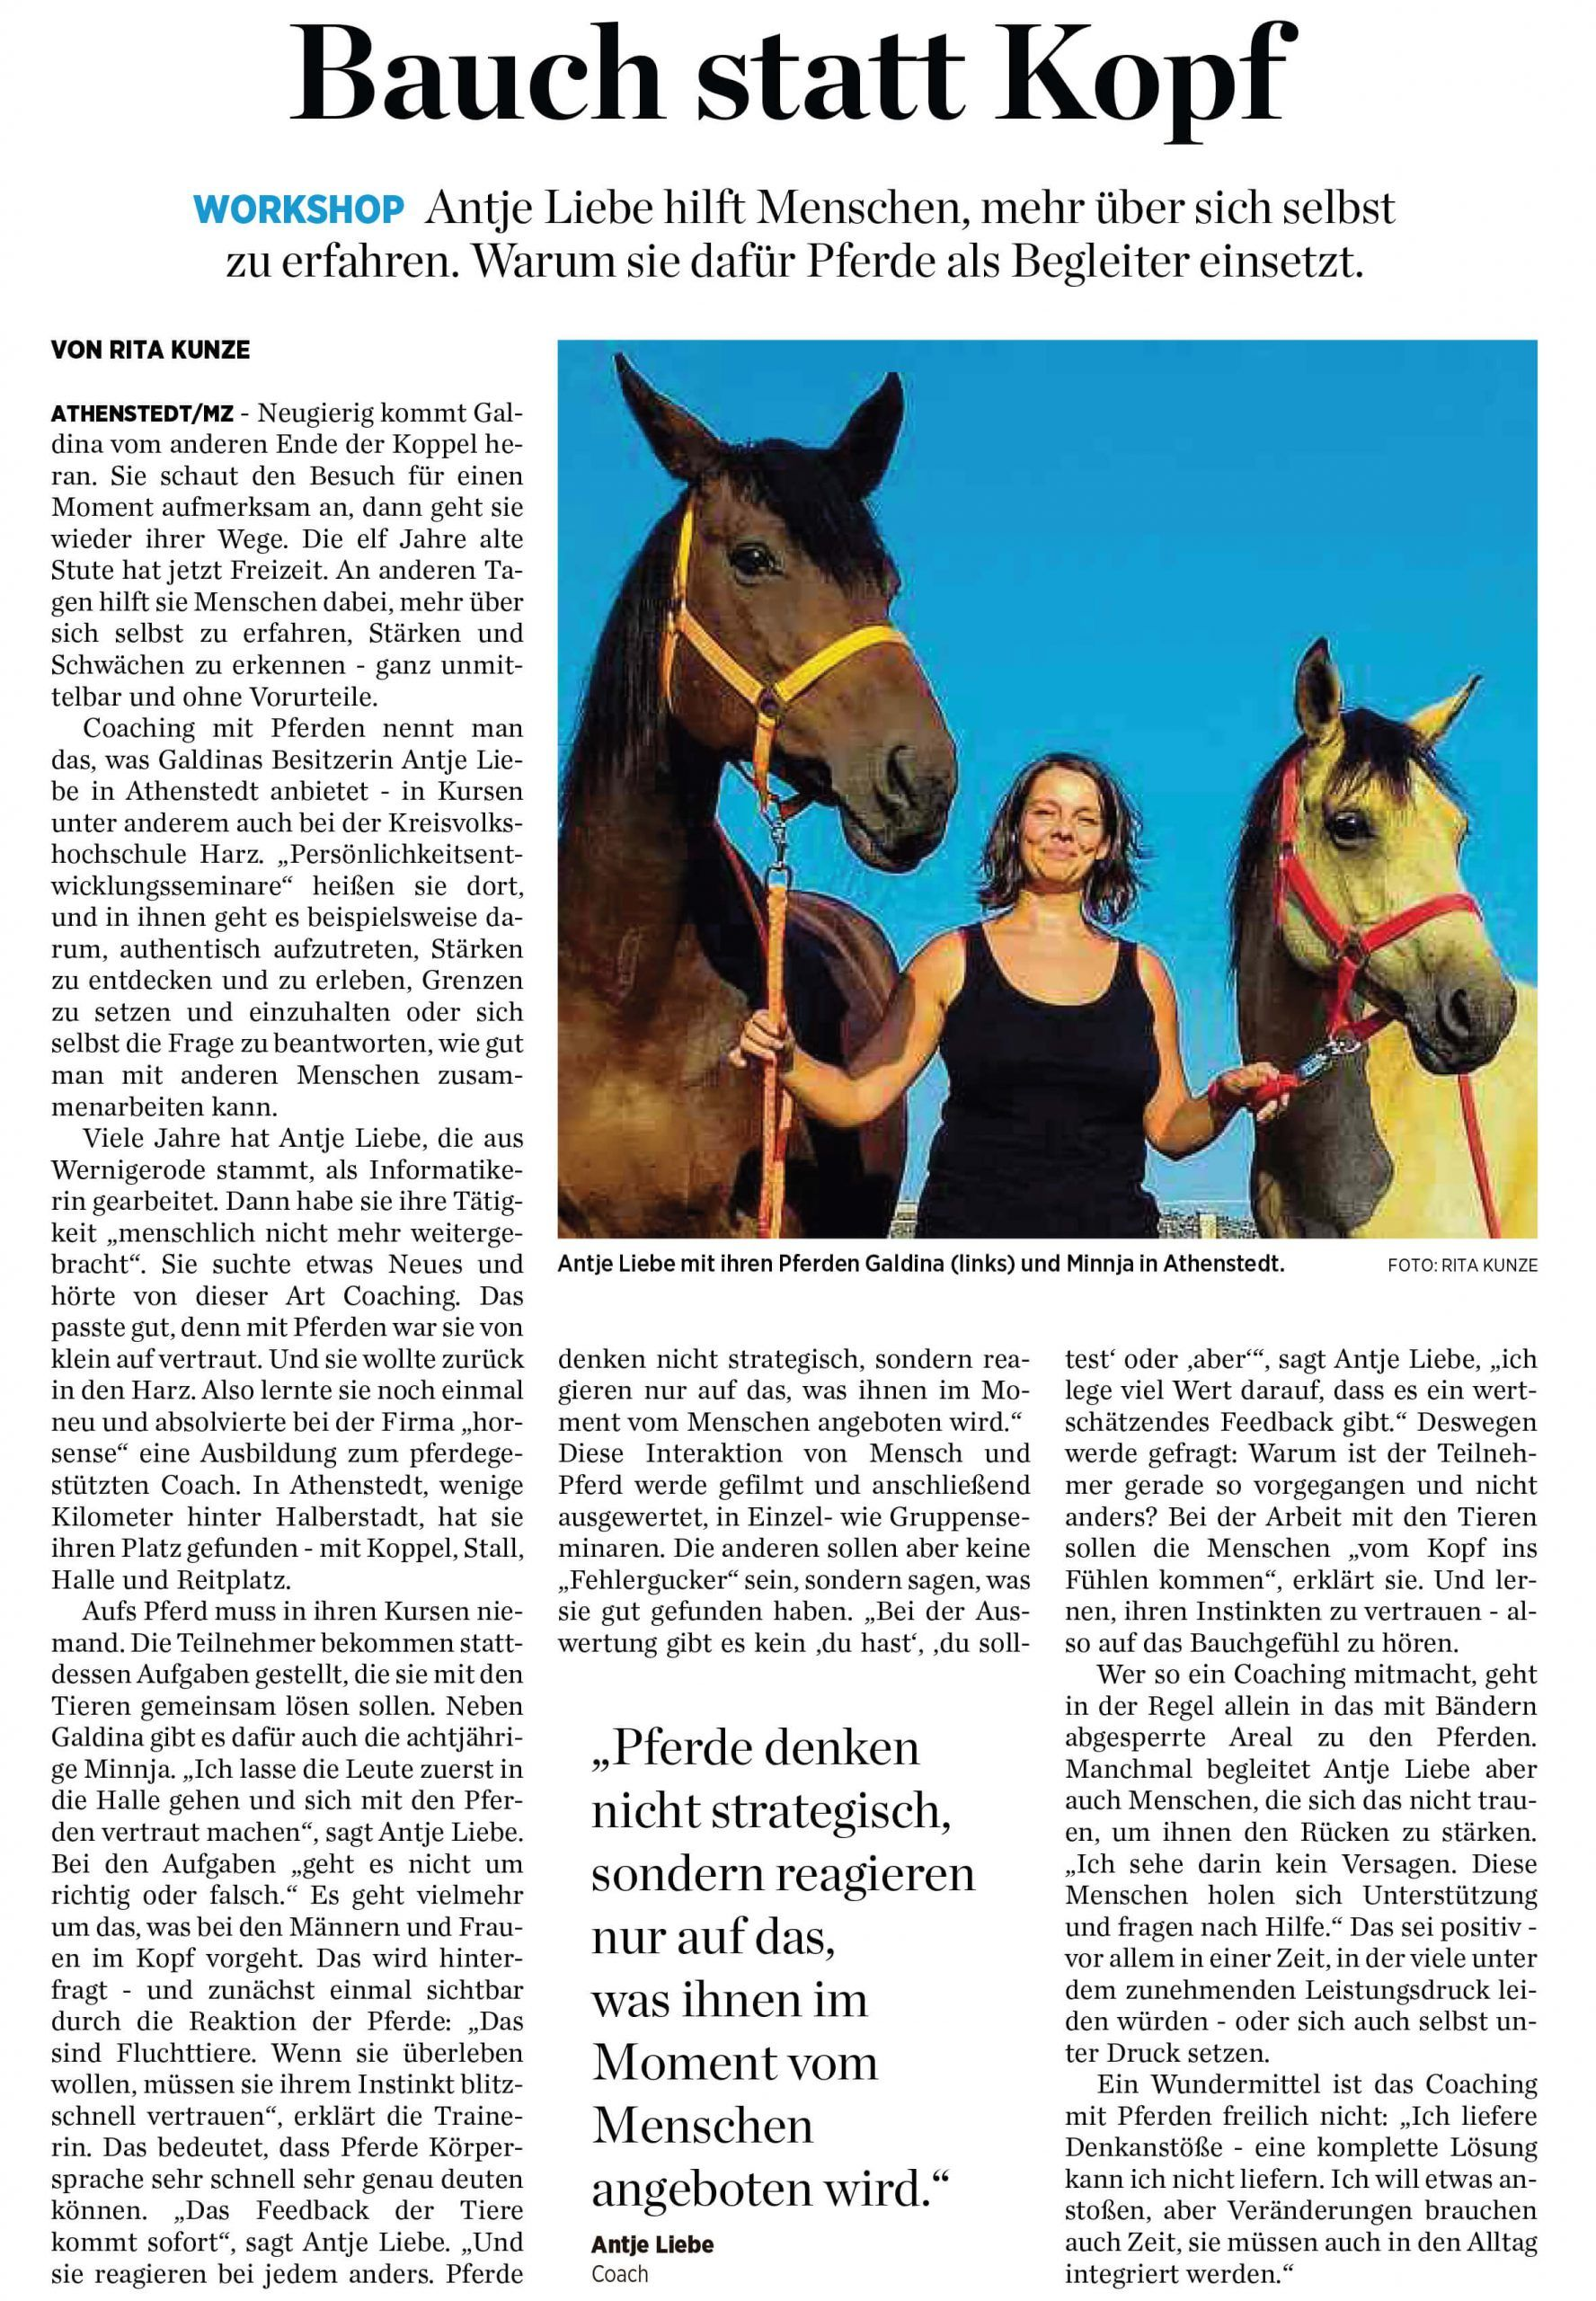 Artikel MZ Quedlinburg 09/2018 | Coaching mit Pferden Harz